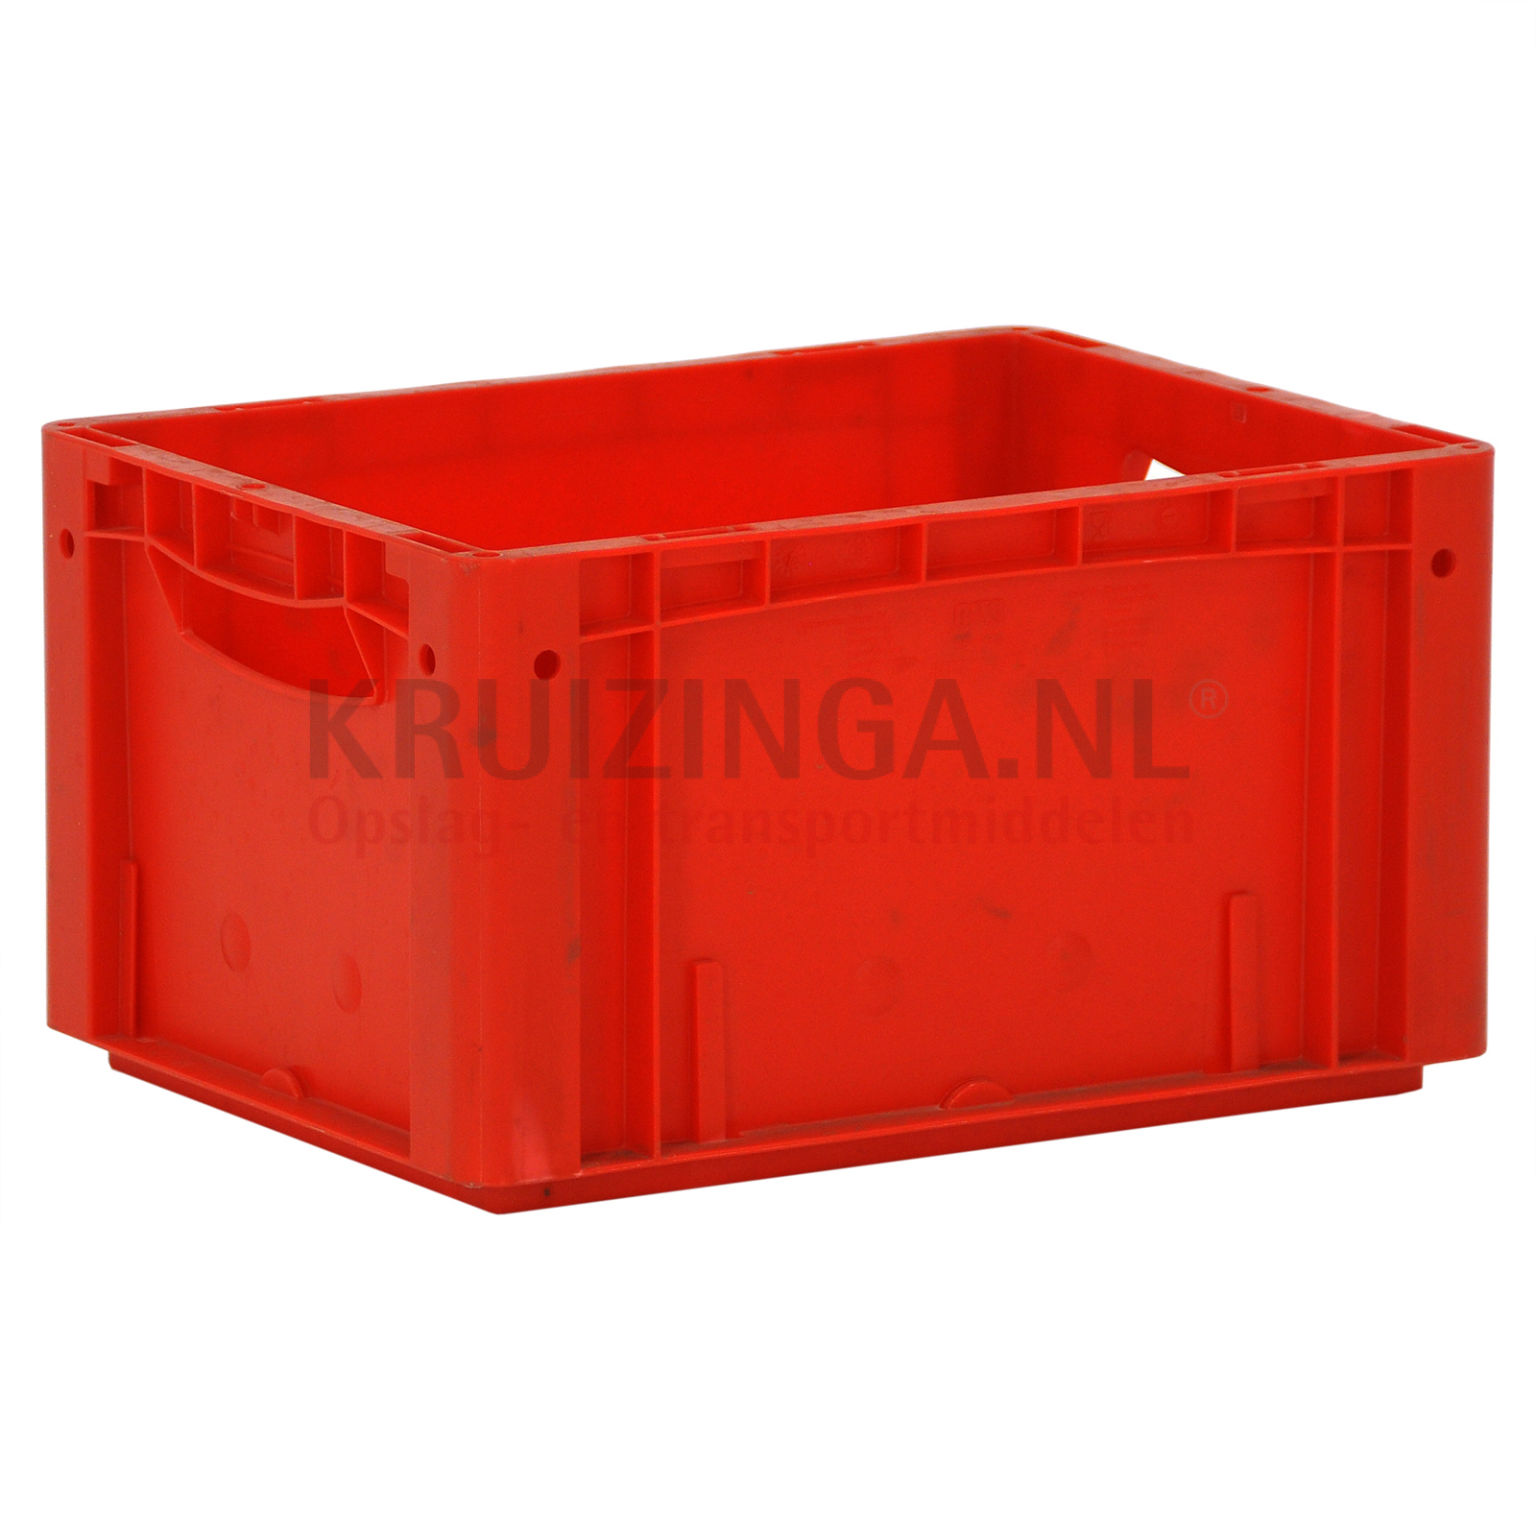 stapelboxen kunststoff stapelbar alle w nde geschlossen offene handgriffe gebraucht. Black Bedroom Furniture Sets. Home Design Ideas